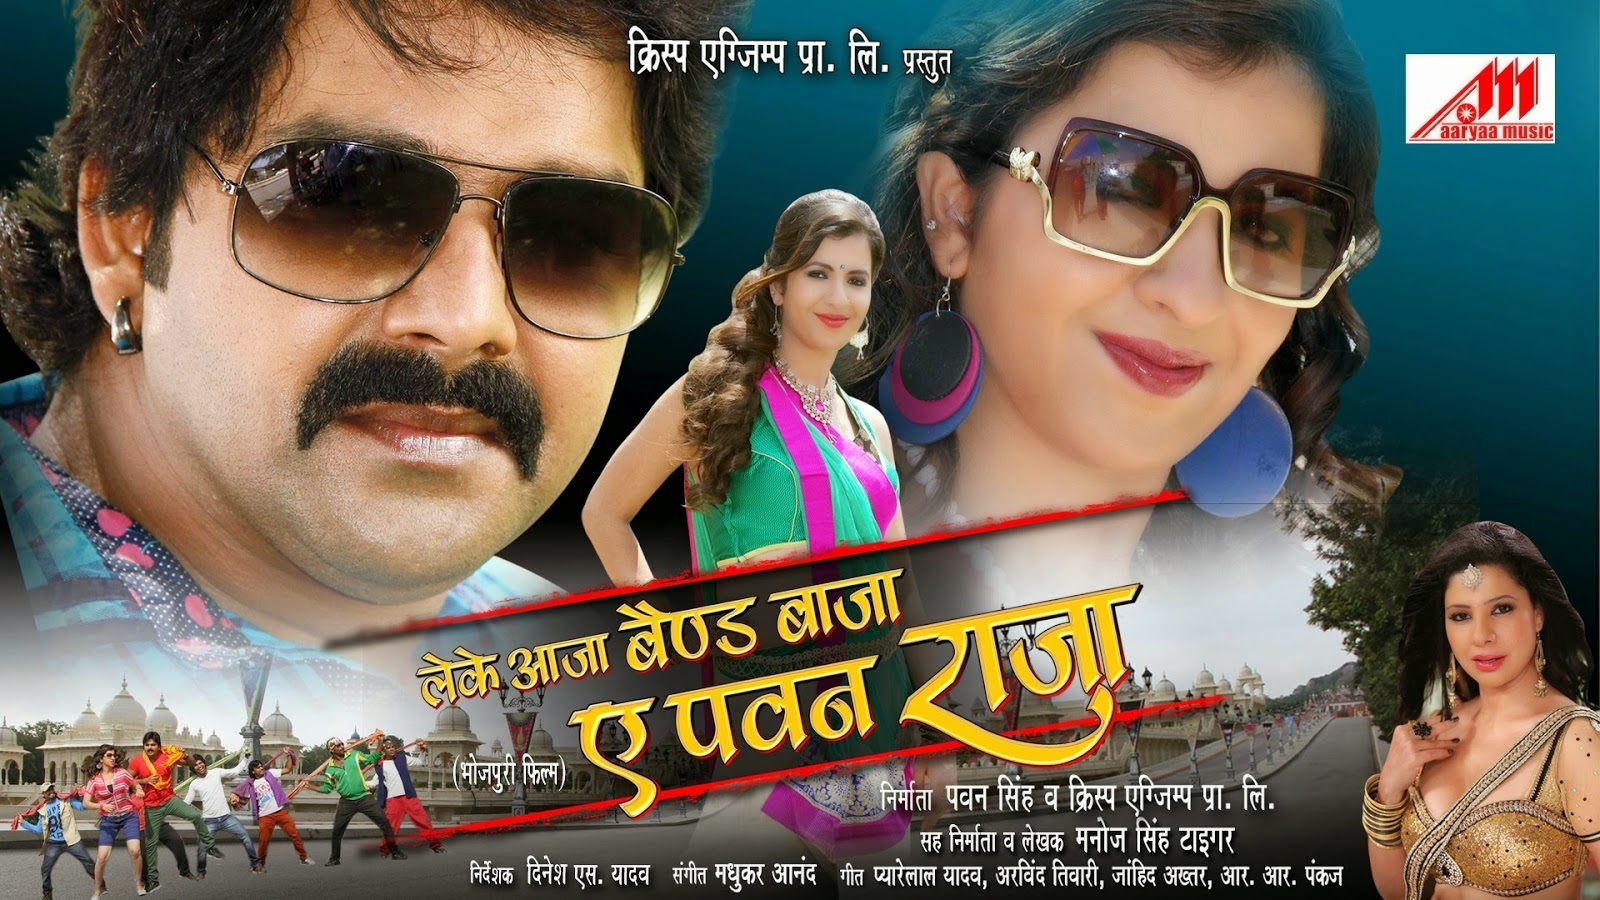 Pawan Singh 'Leke Aaja Band Baja Ae Pawan Raja' release on 24th April, 2015